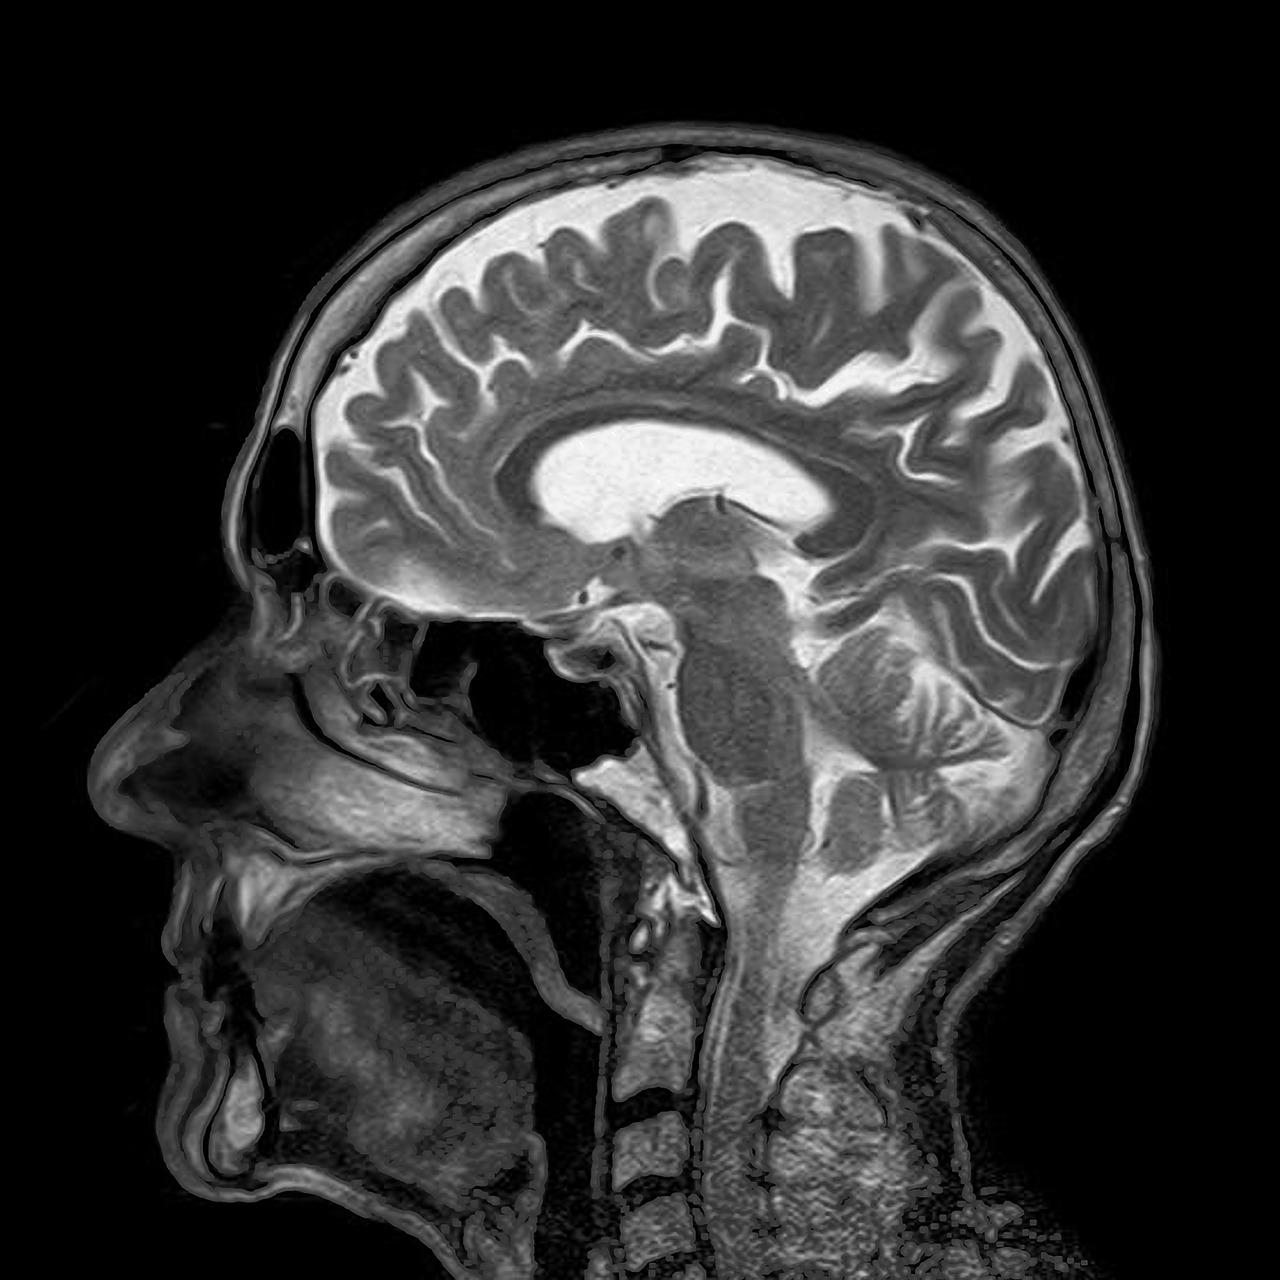 Снимок МРТ